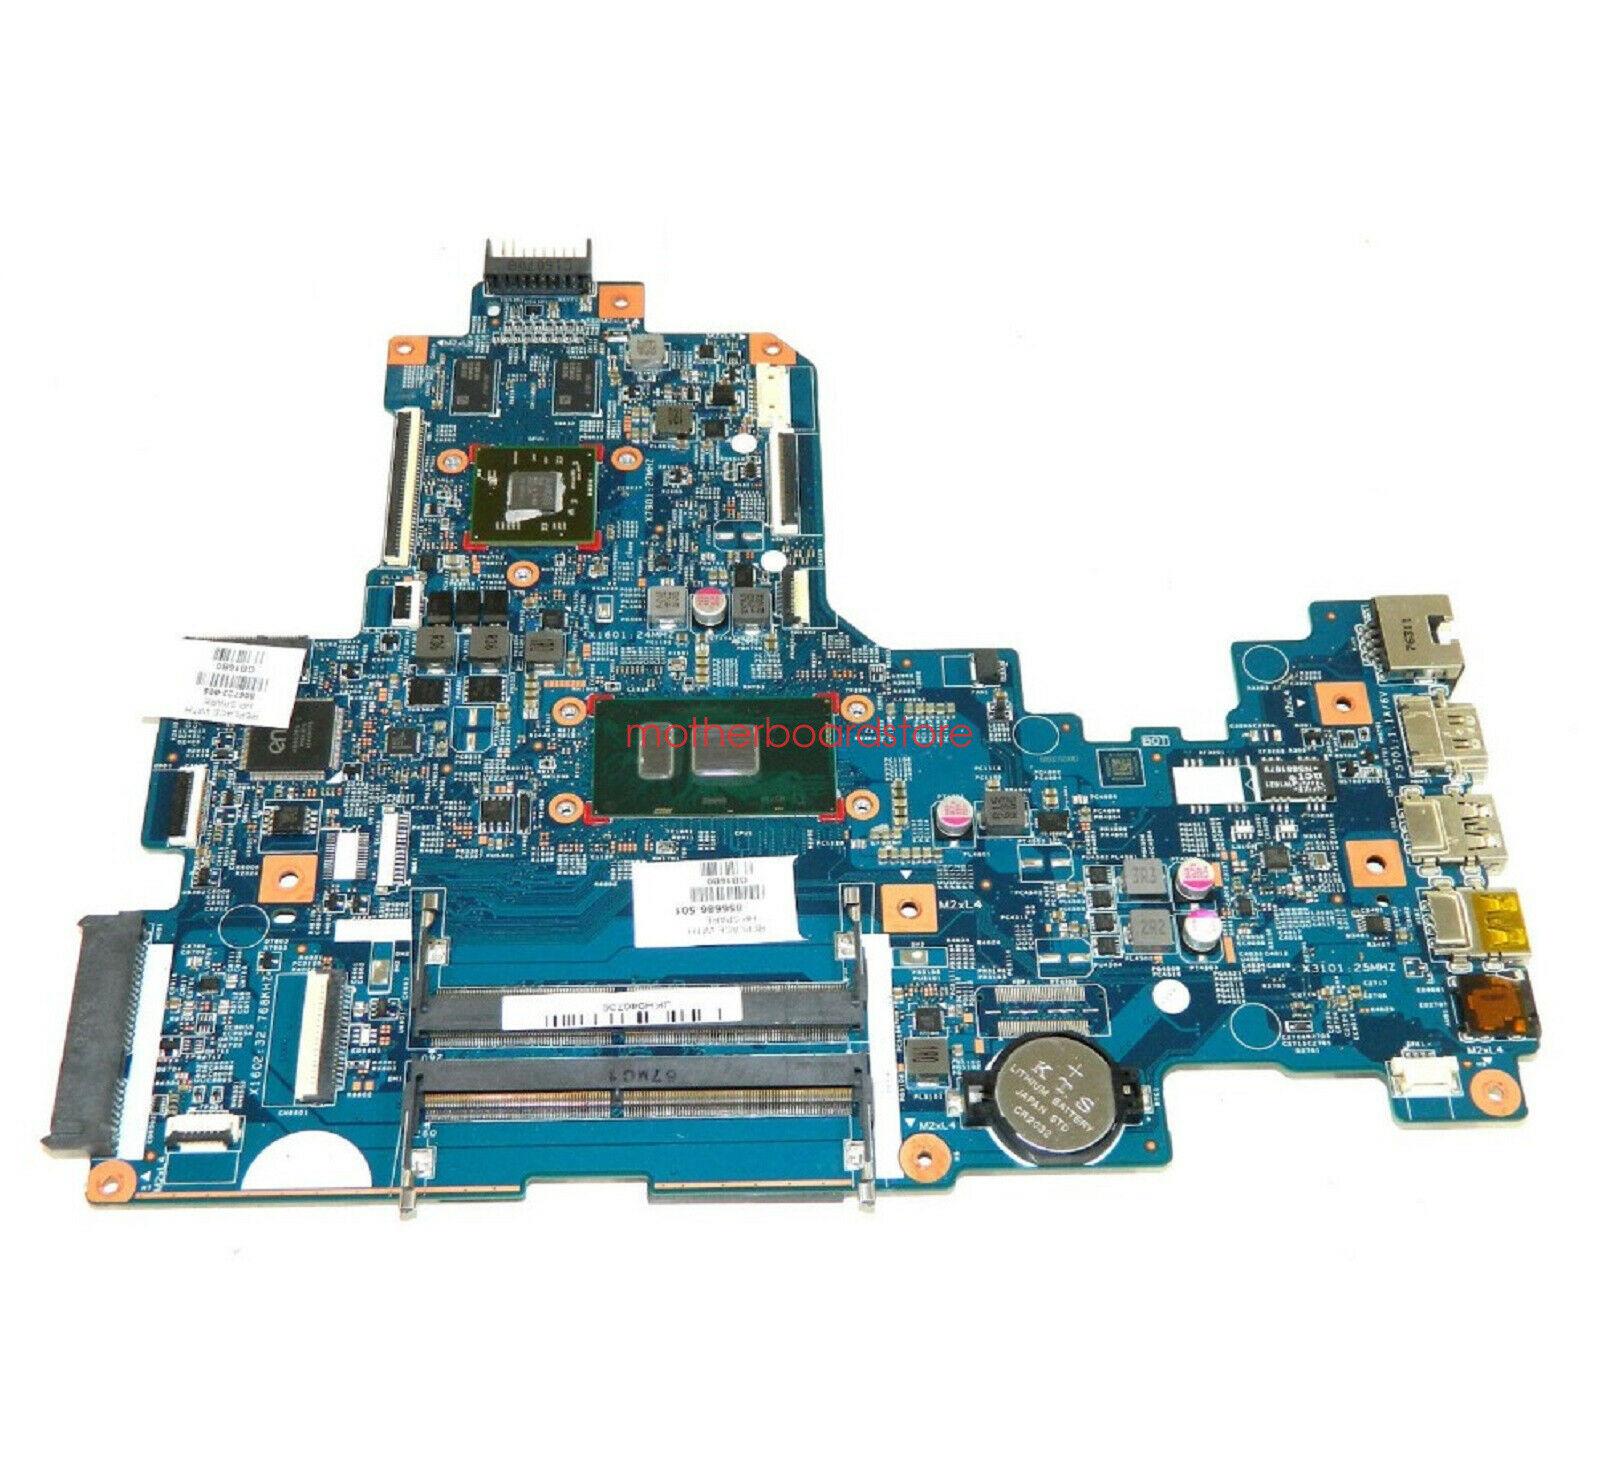 689157-001 LA-8731P for HP ENVY 6 laptop motherboard A6-4455M CPU